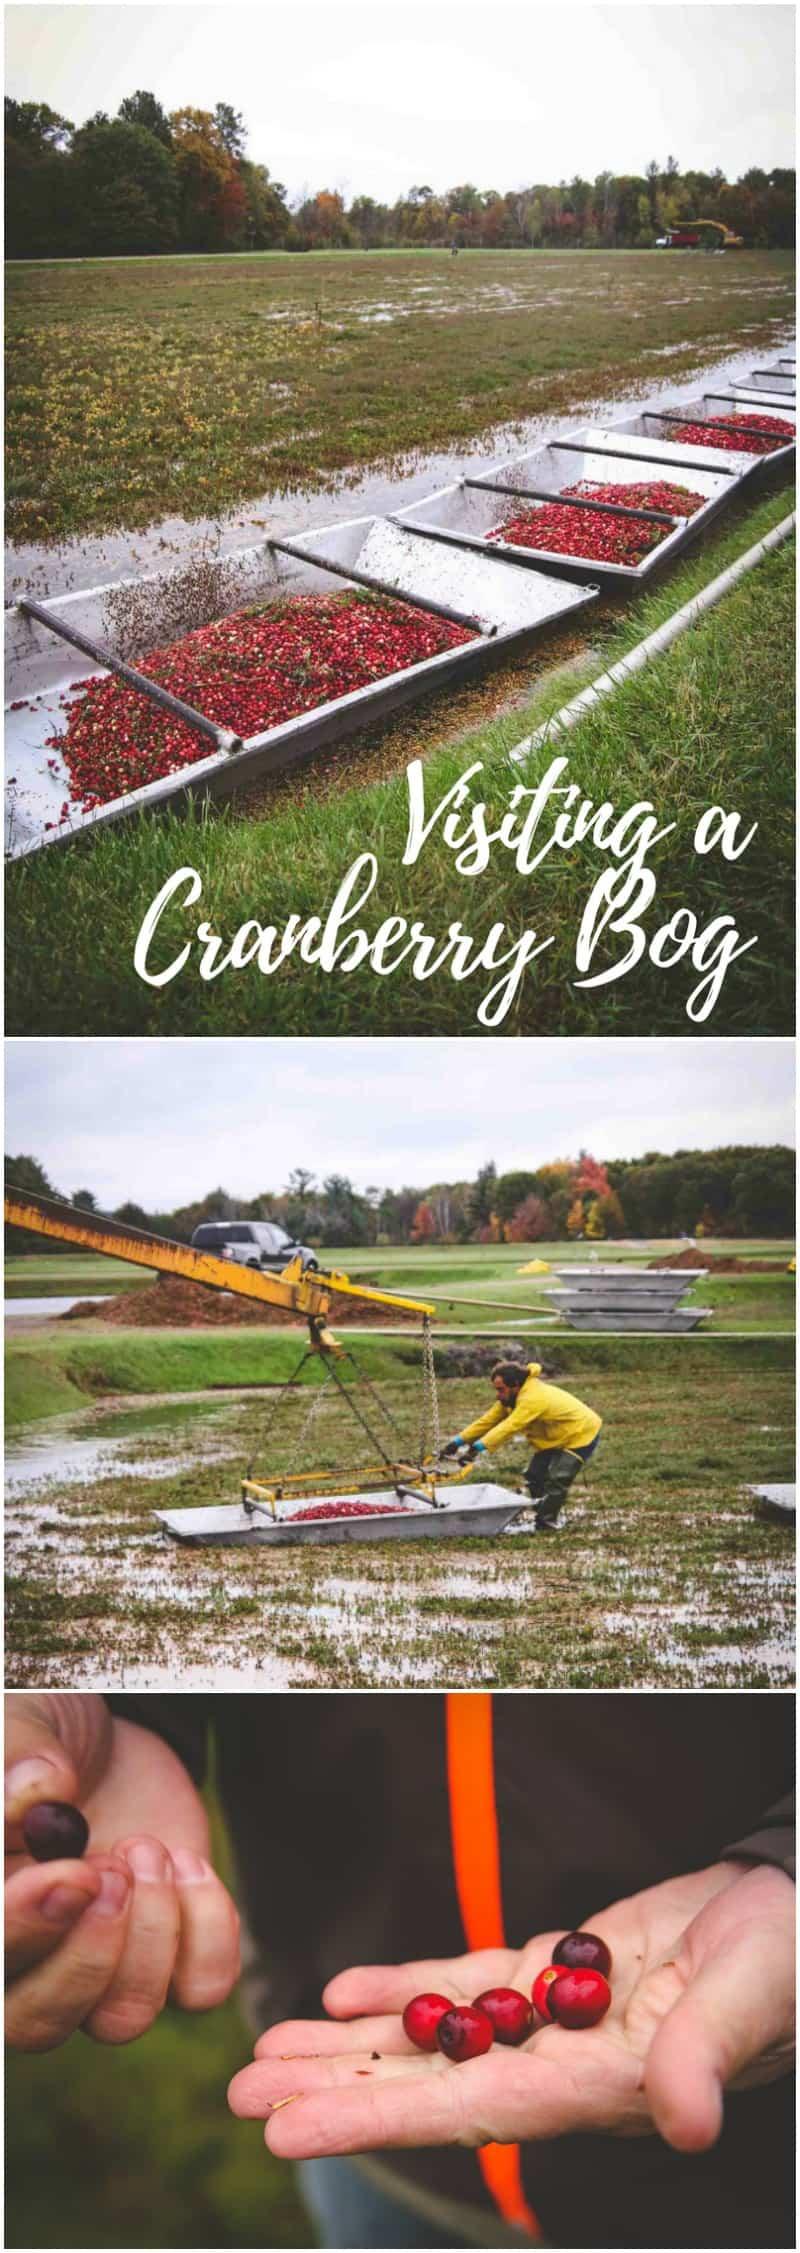 Visiting a Wisconsin cranberry bog